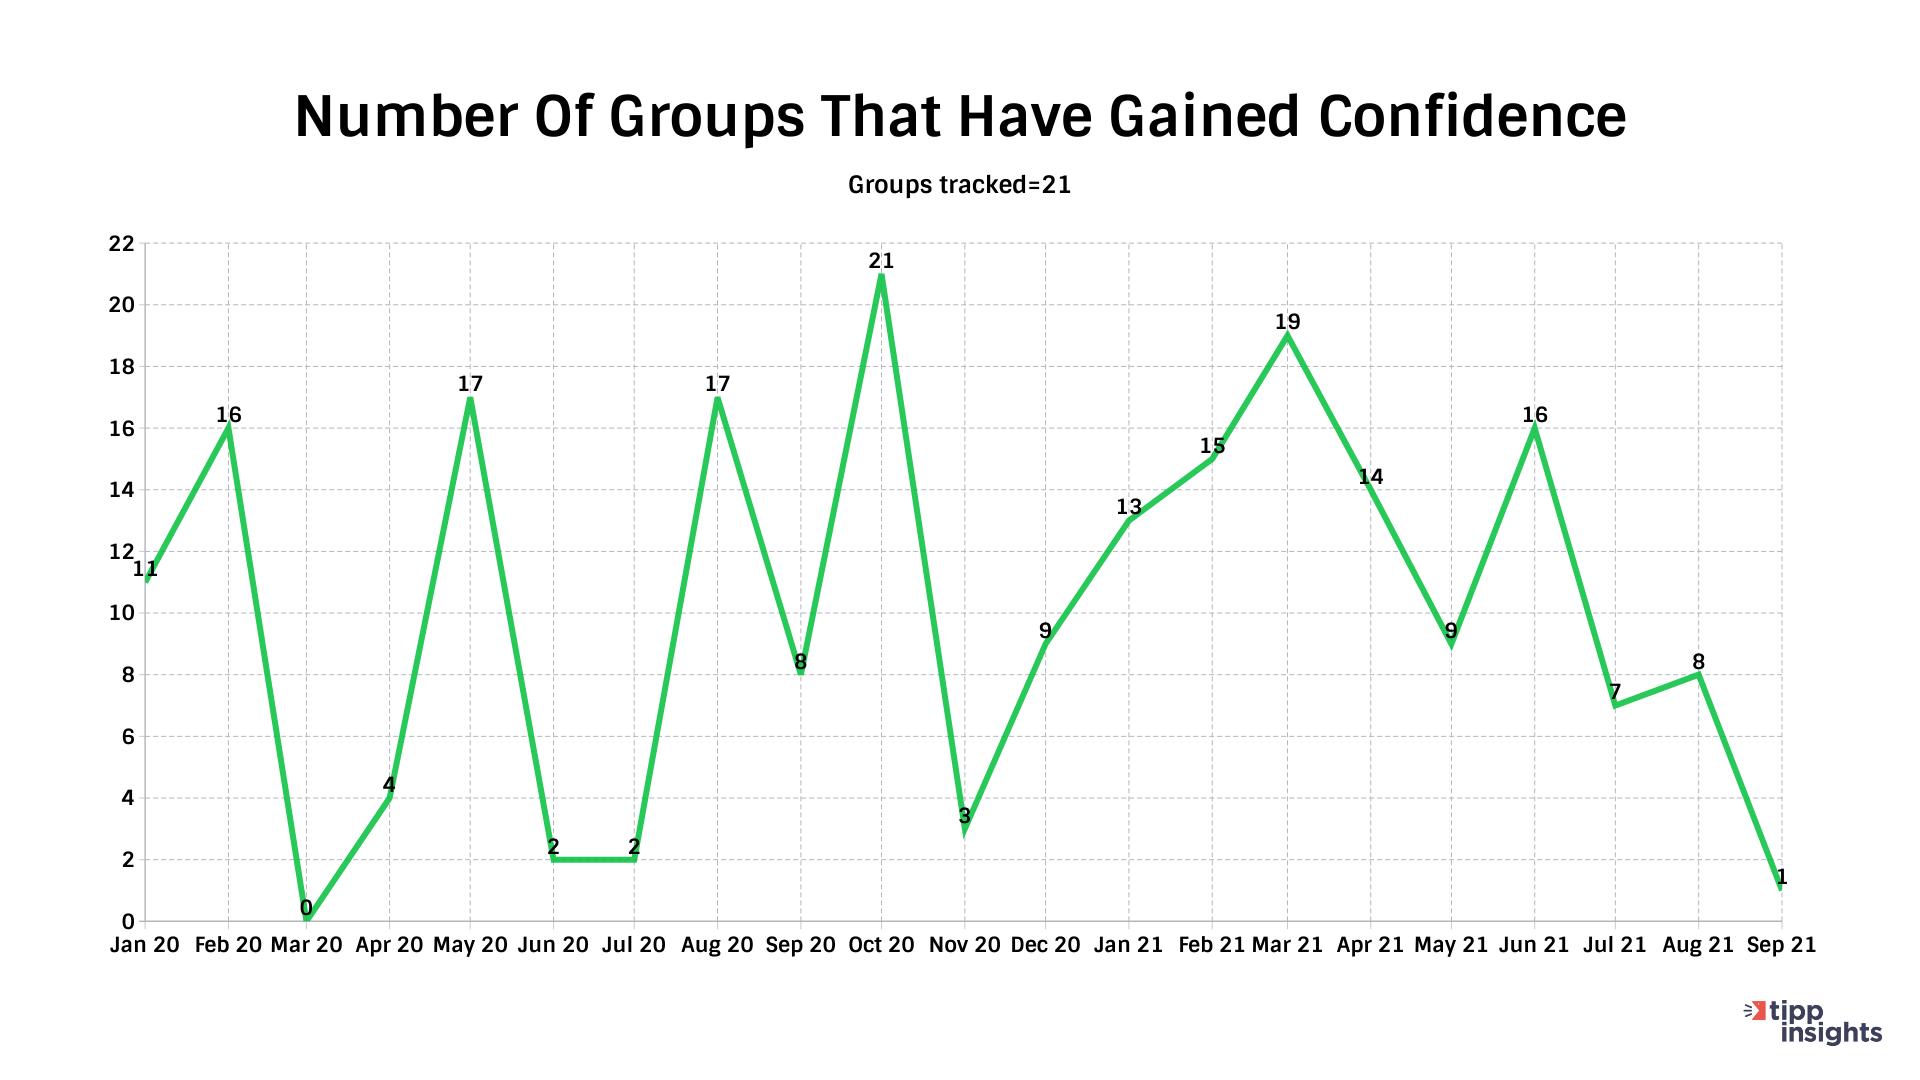 IBD/TIPP Economic Optimism Index Number of groups improving